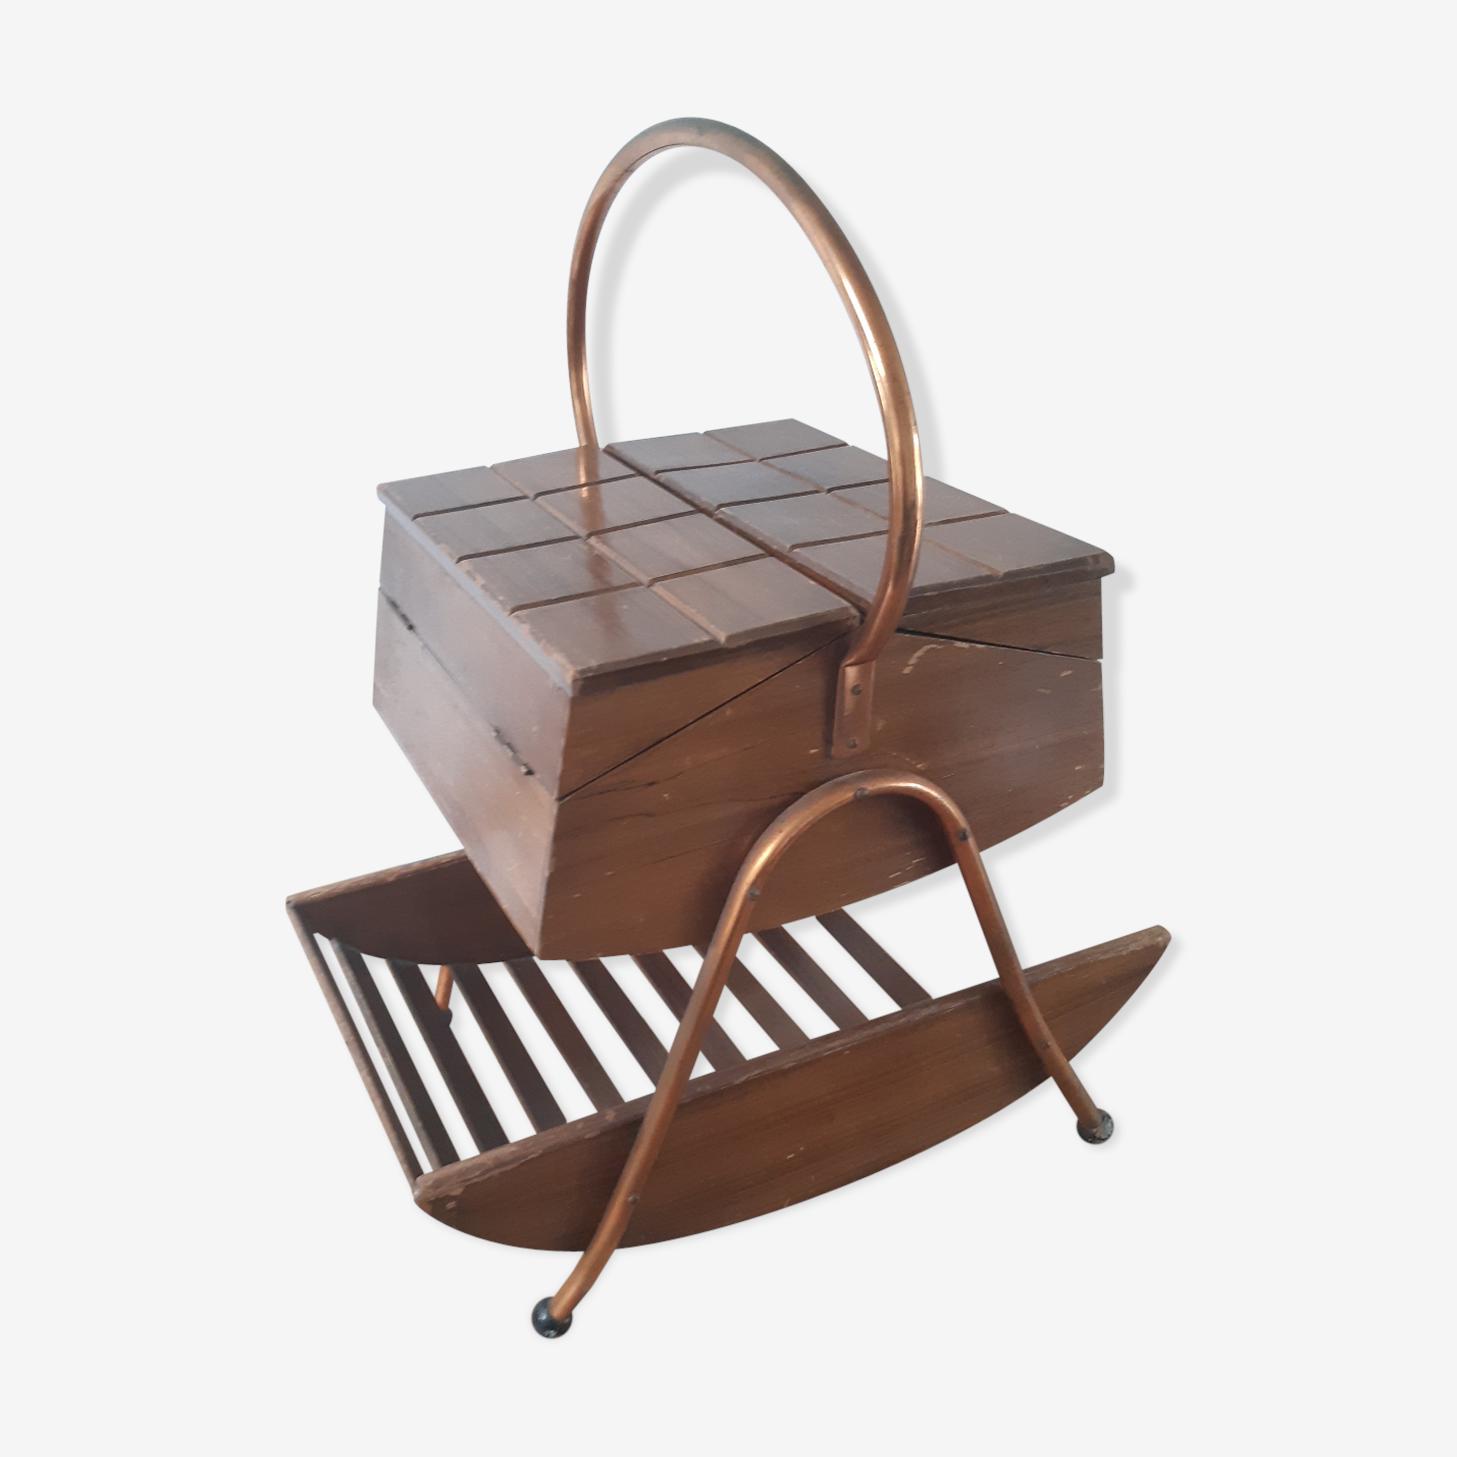 Sewing basket  50 years